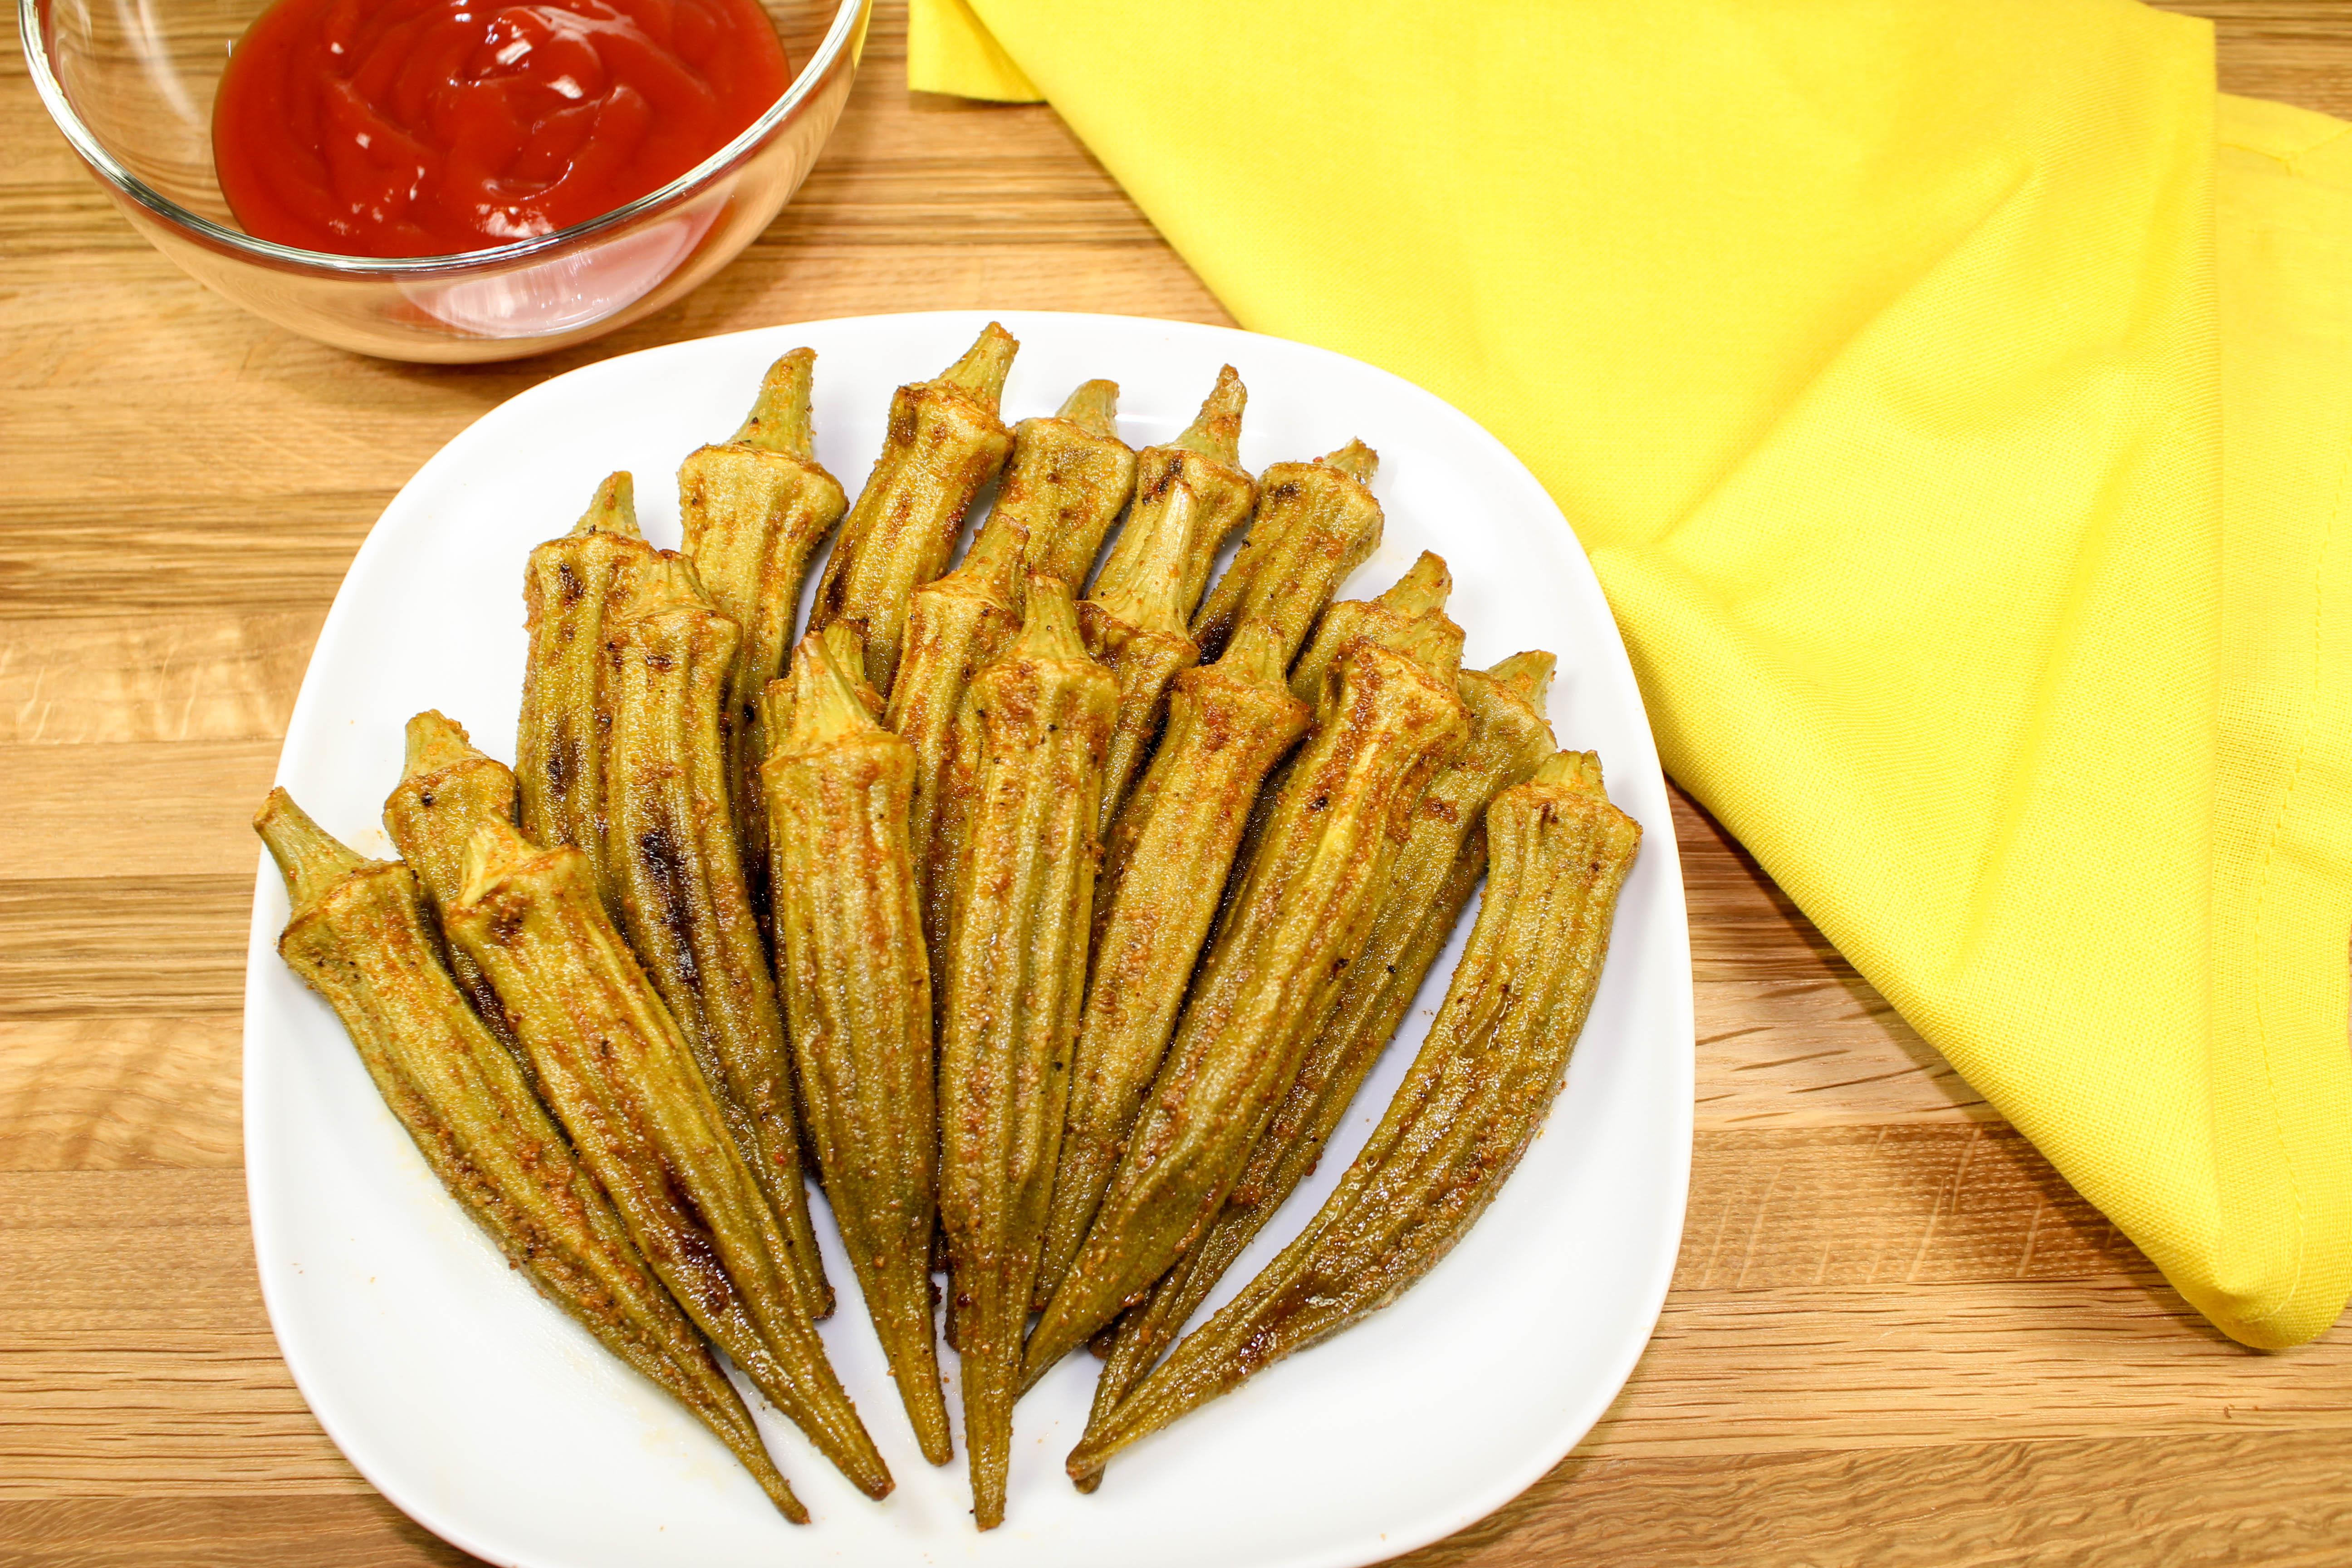 Cajun Baked Okra is packed with Cajun seasonings, crispy, and easy to make. Healthy alternative to fried okra! Weight Watchers friendly recipe. www.bitesofflavor.com